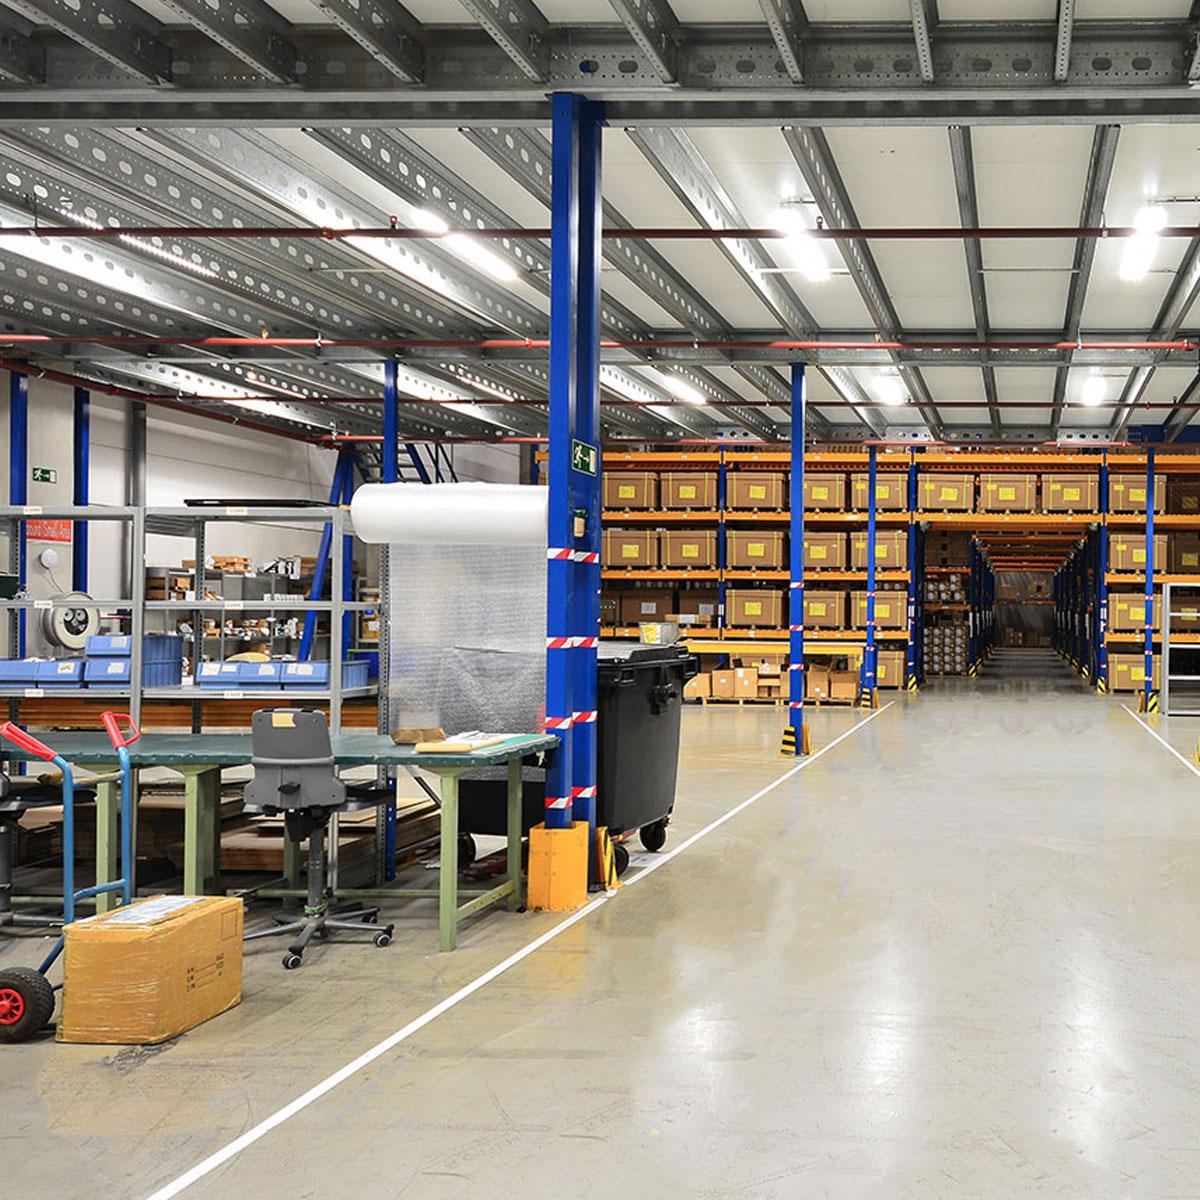 fufillment warehouse